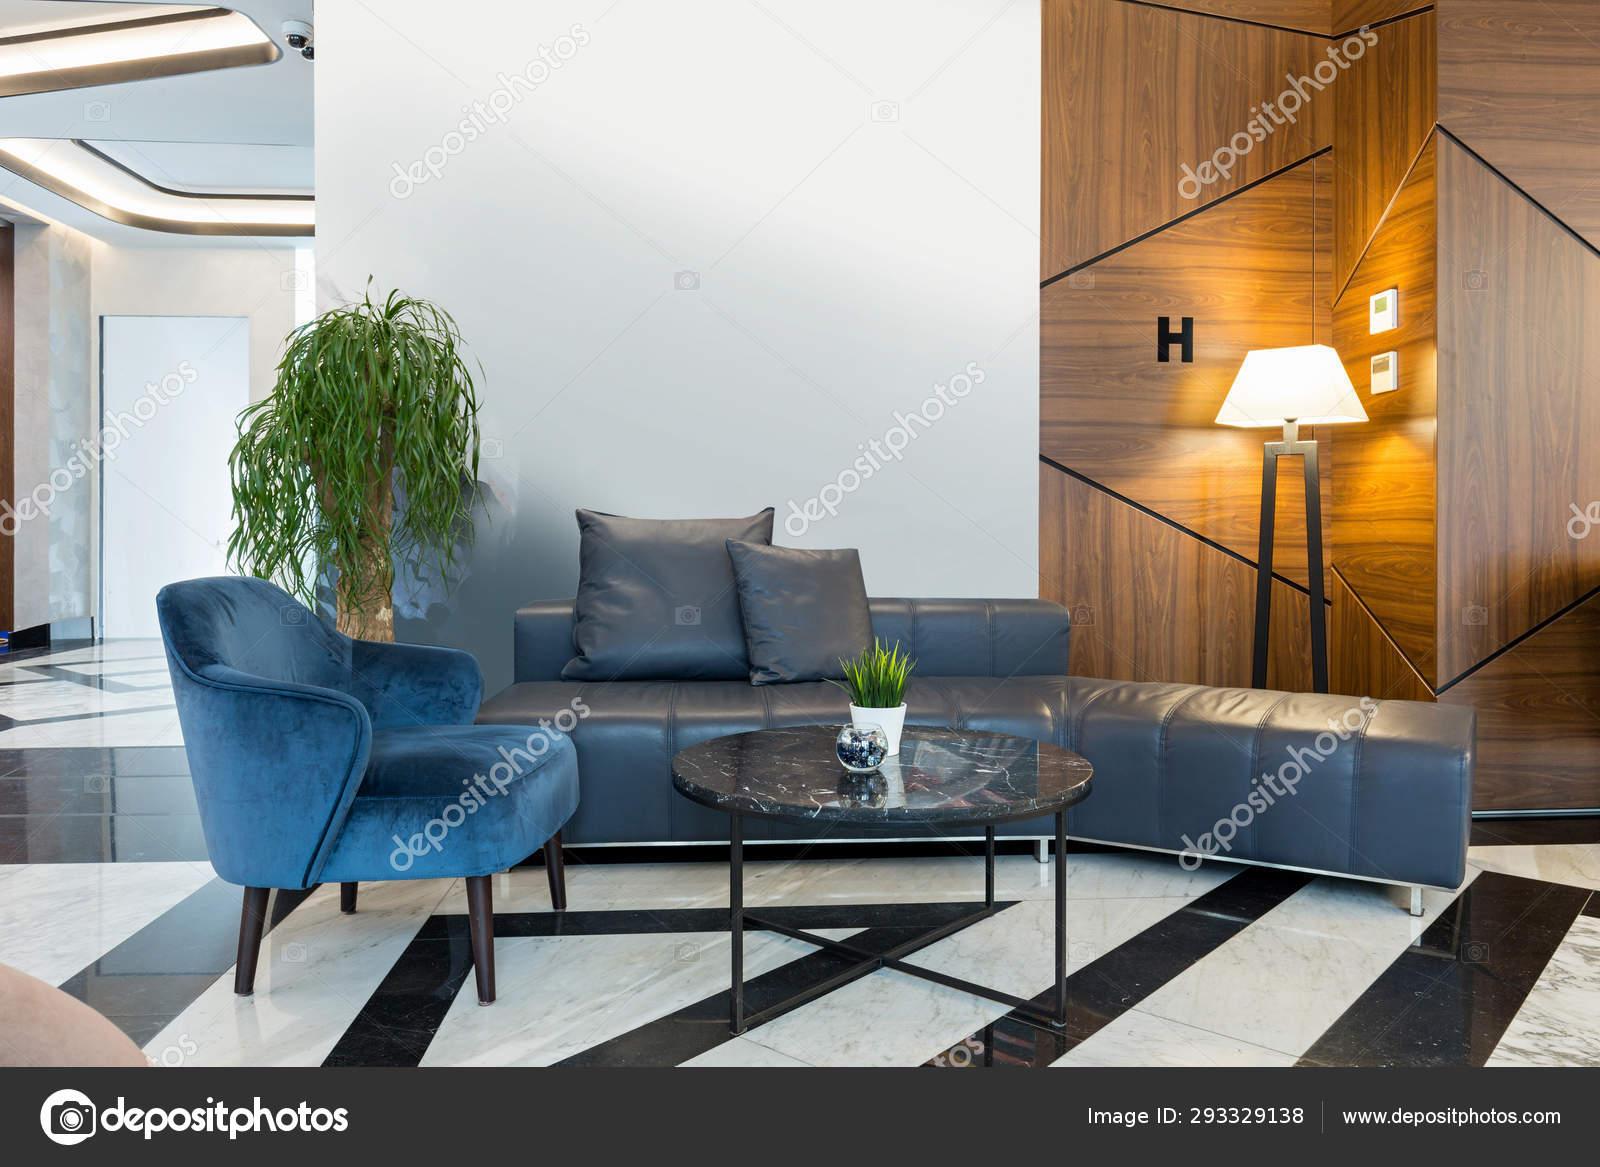 Interior Of A Modern Hotel Lounge Cafe Bar Restaurant Stock Photo C Rilueda 293329138